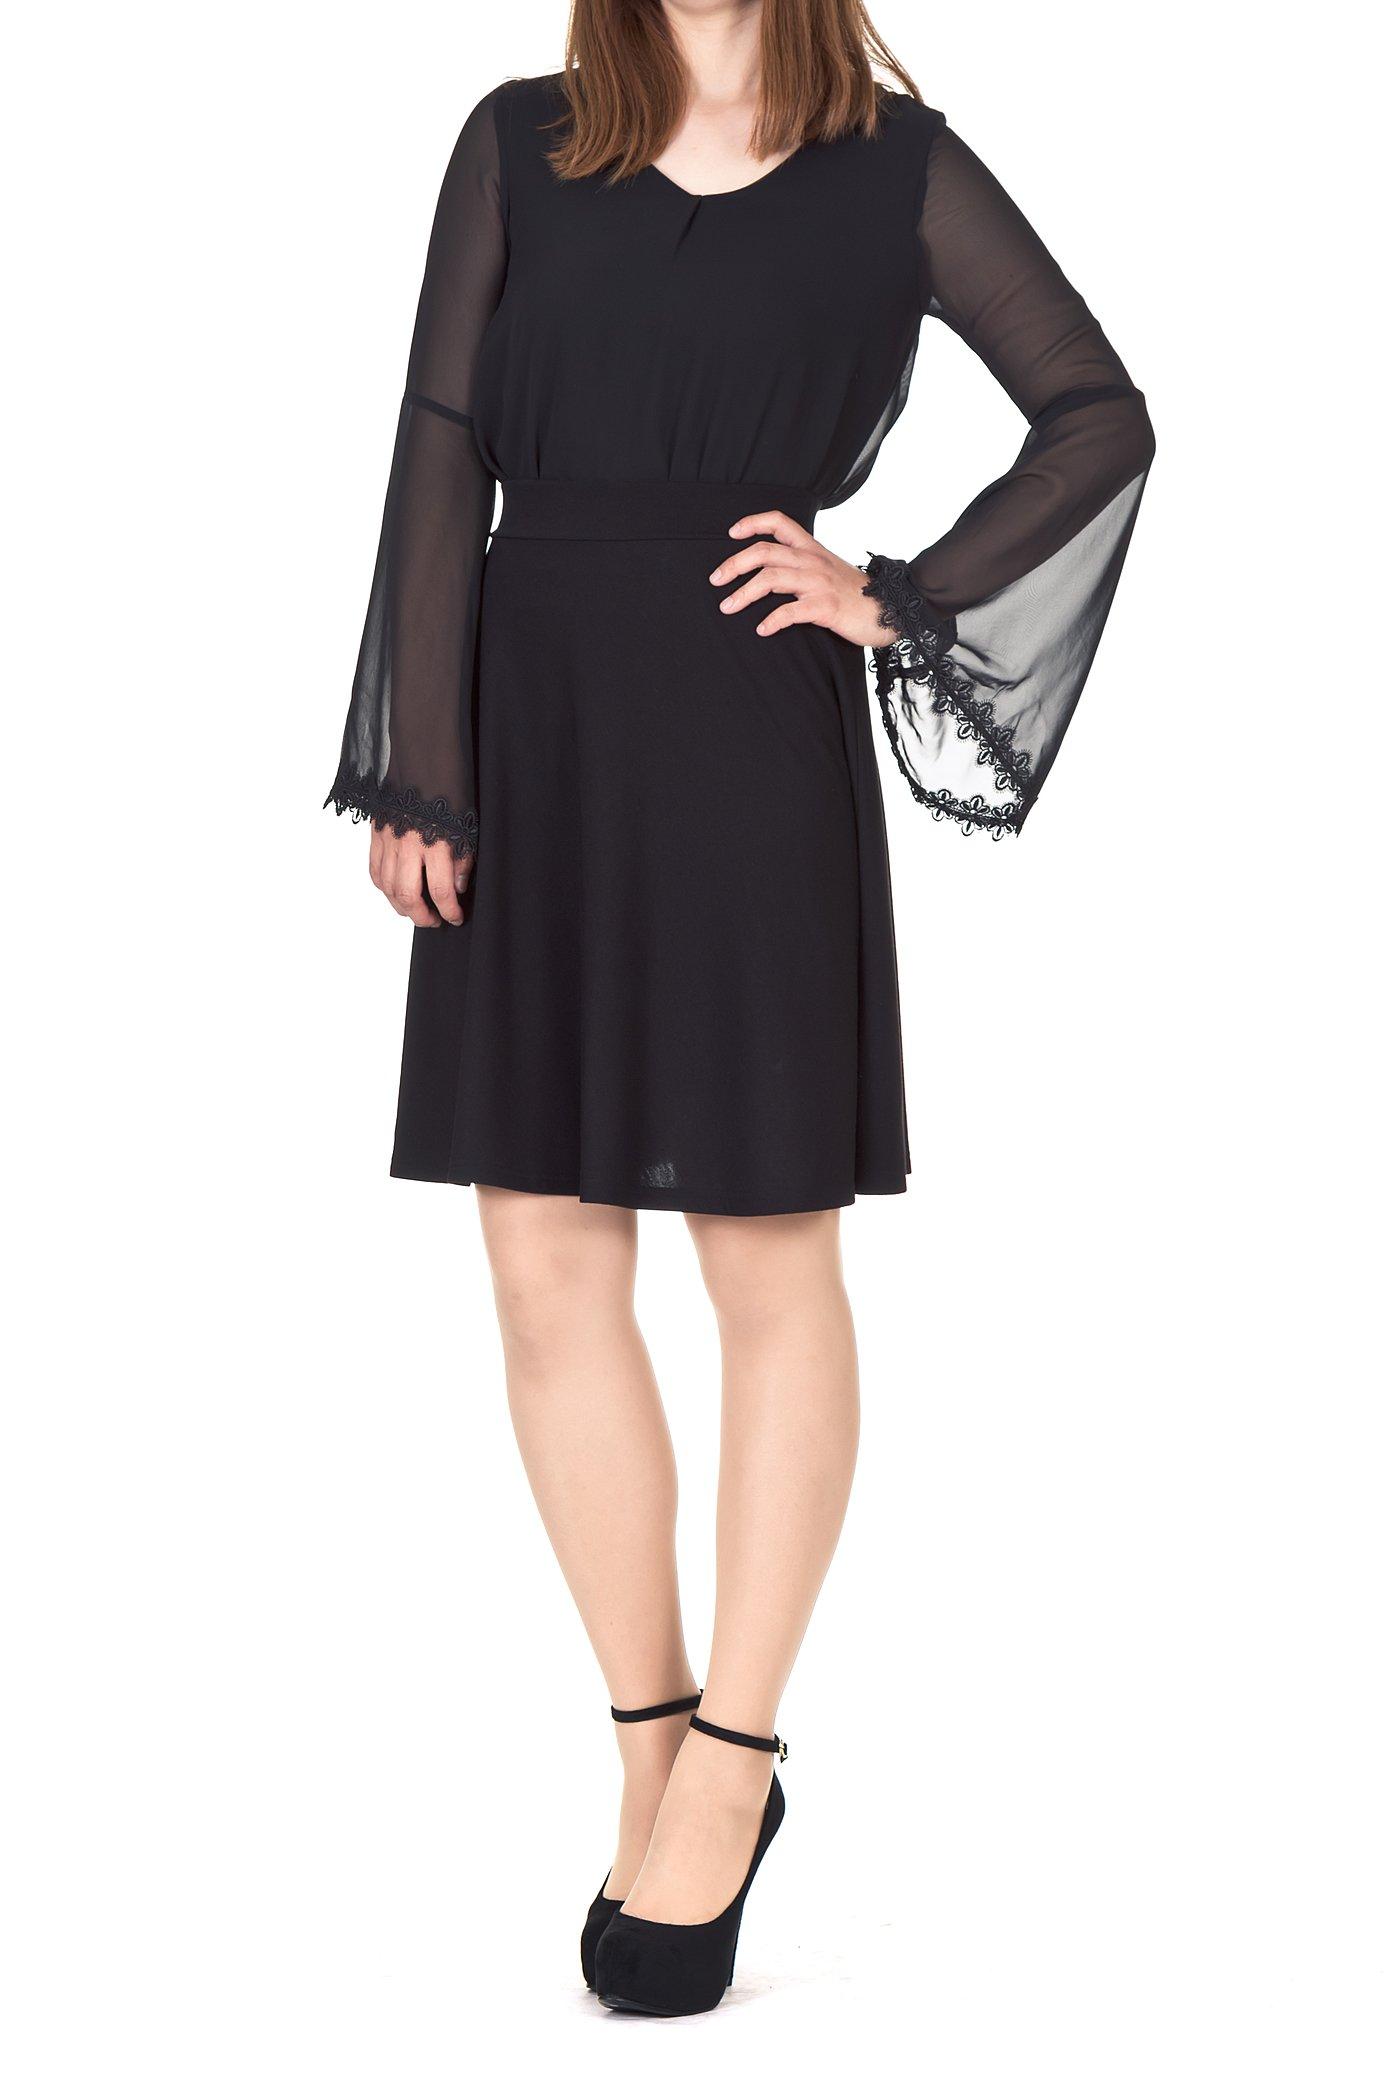 Simple Stretch A-line Flared Knee Length Skirt (XL, Knee Black)